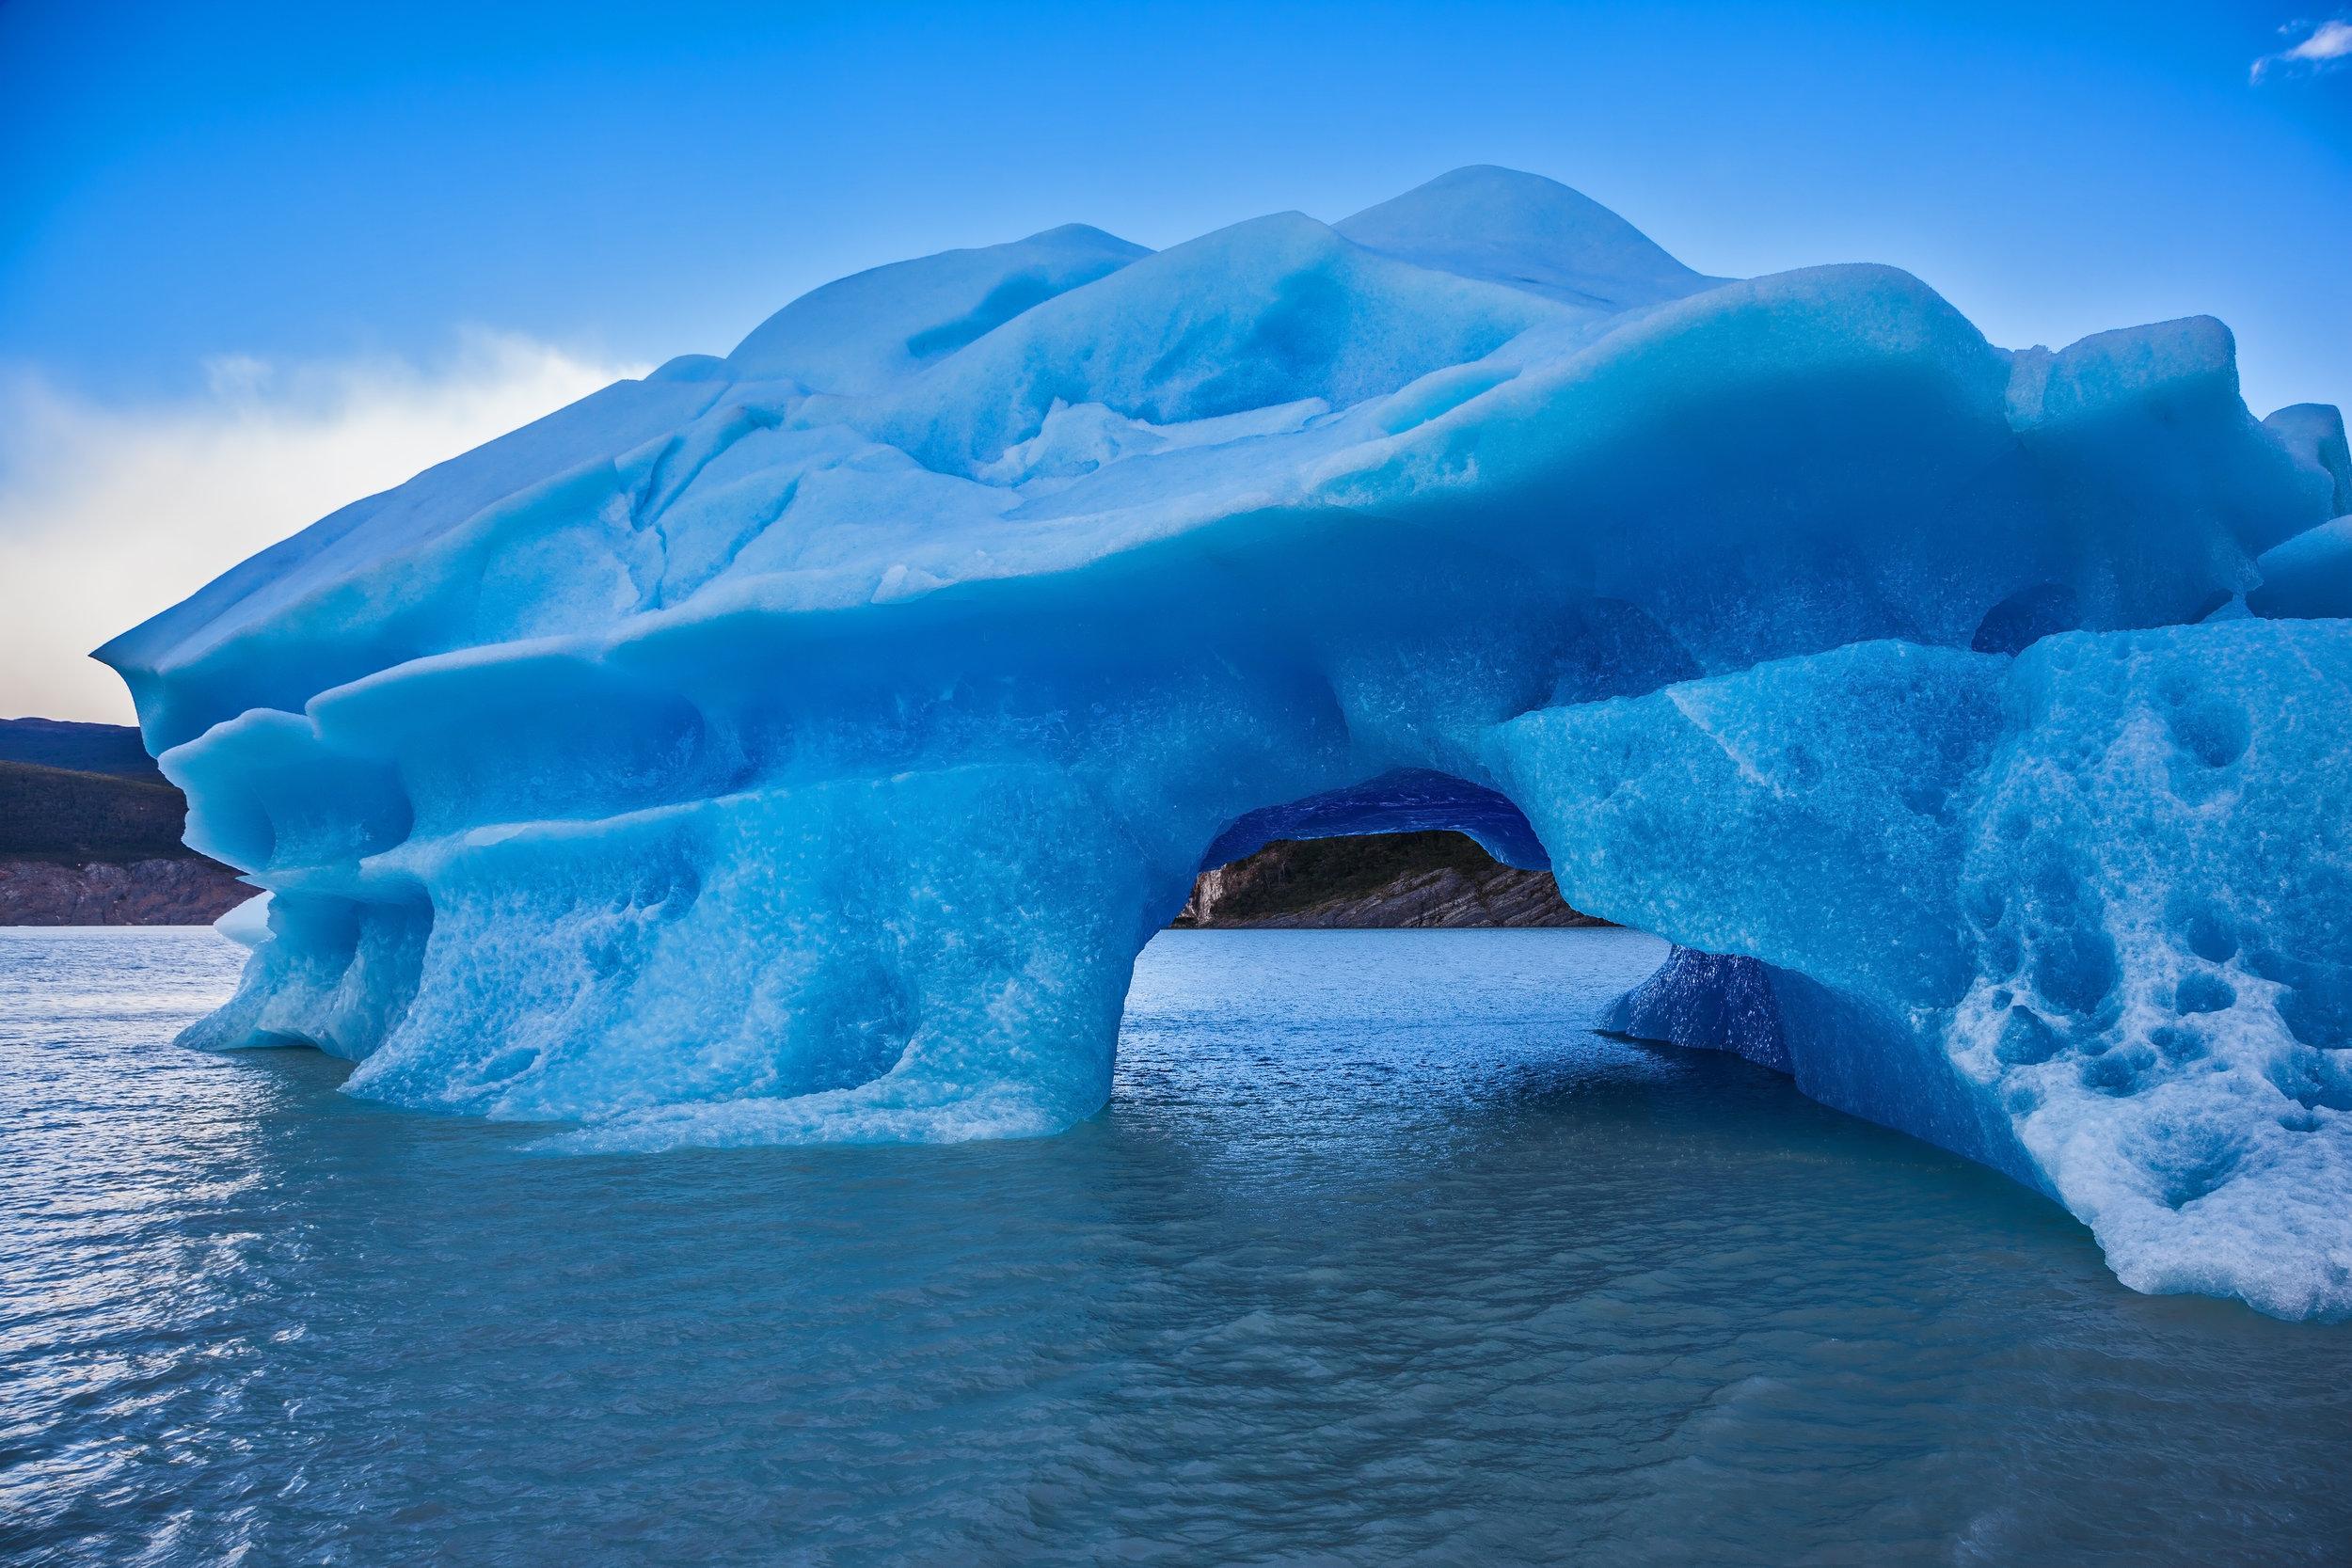 chile_patagonia_bigstock-The-huge-icebergs-and-ice-floe-149075051.jpg